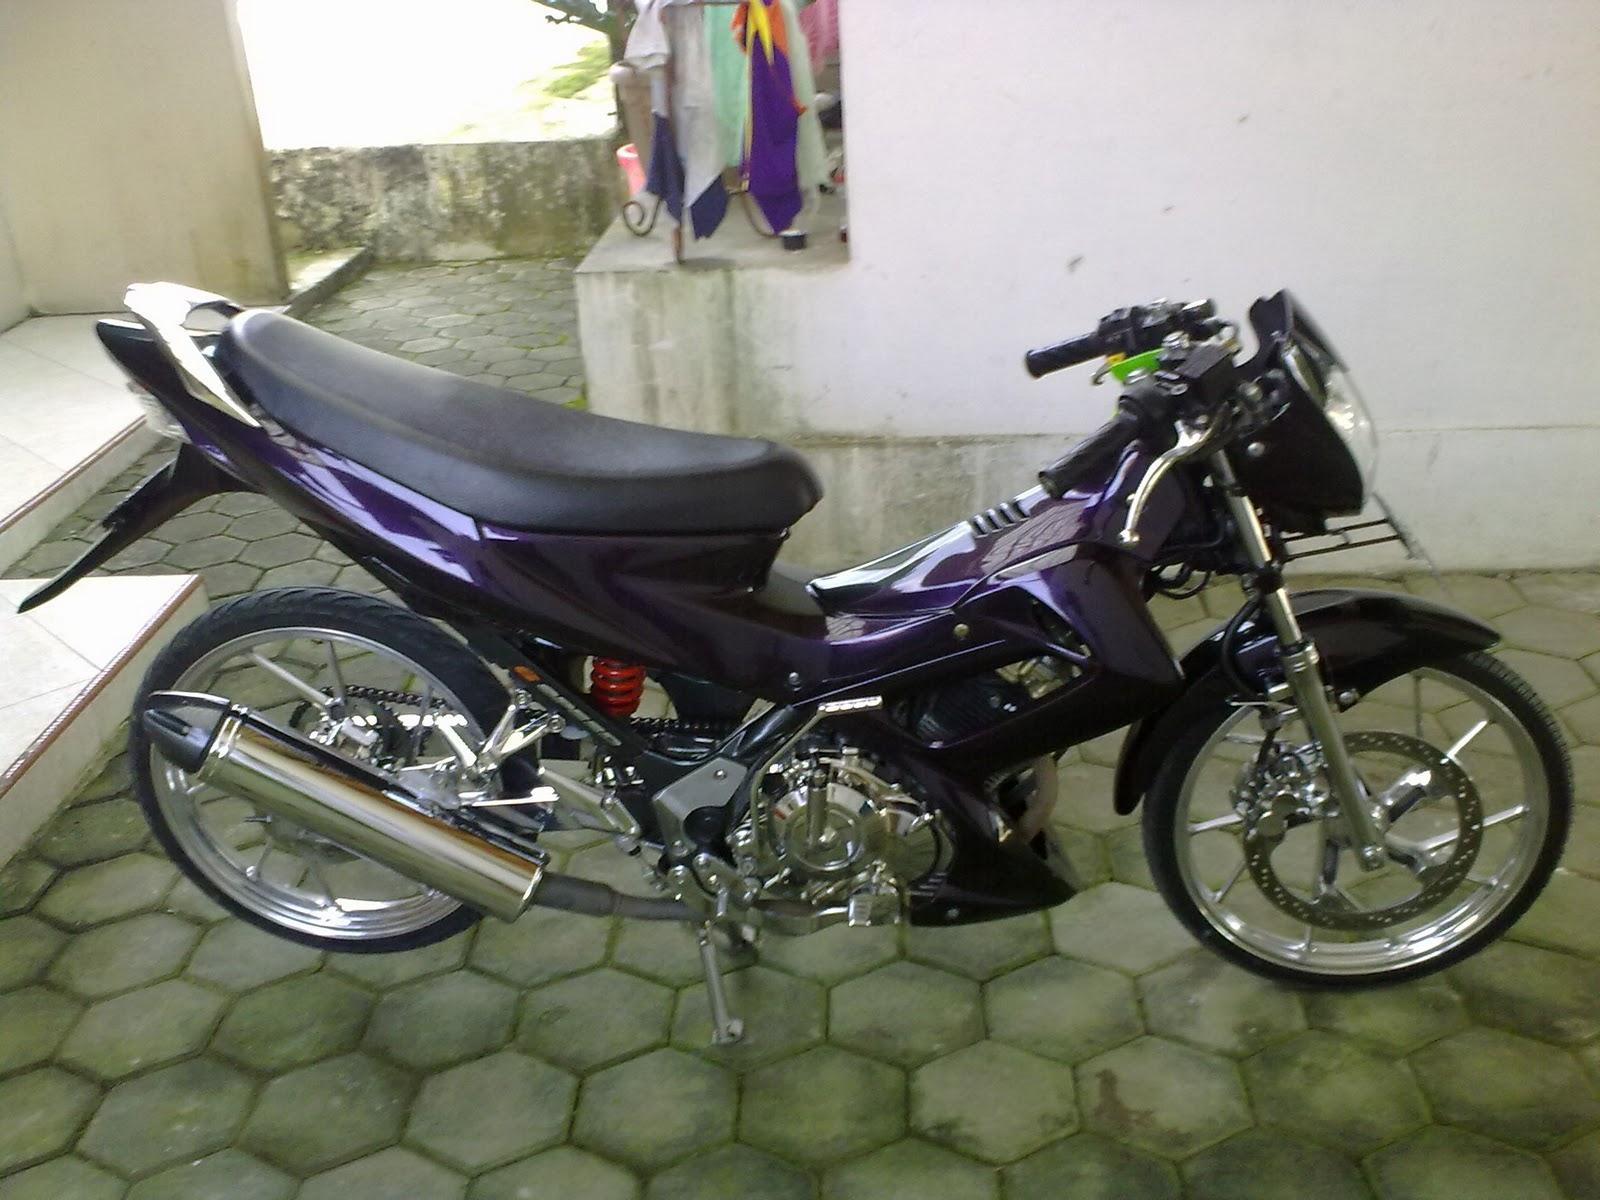 Modifikasi Vespa Ceper atau Low Rider